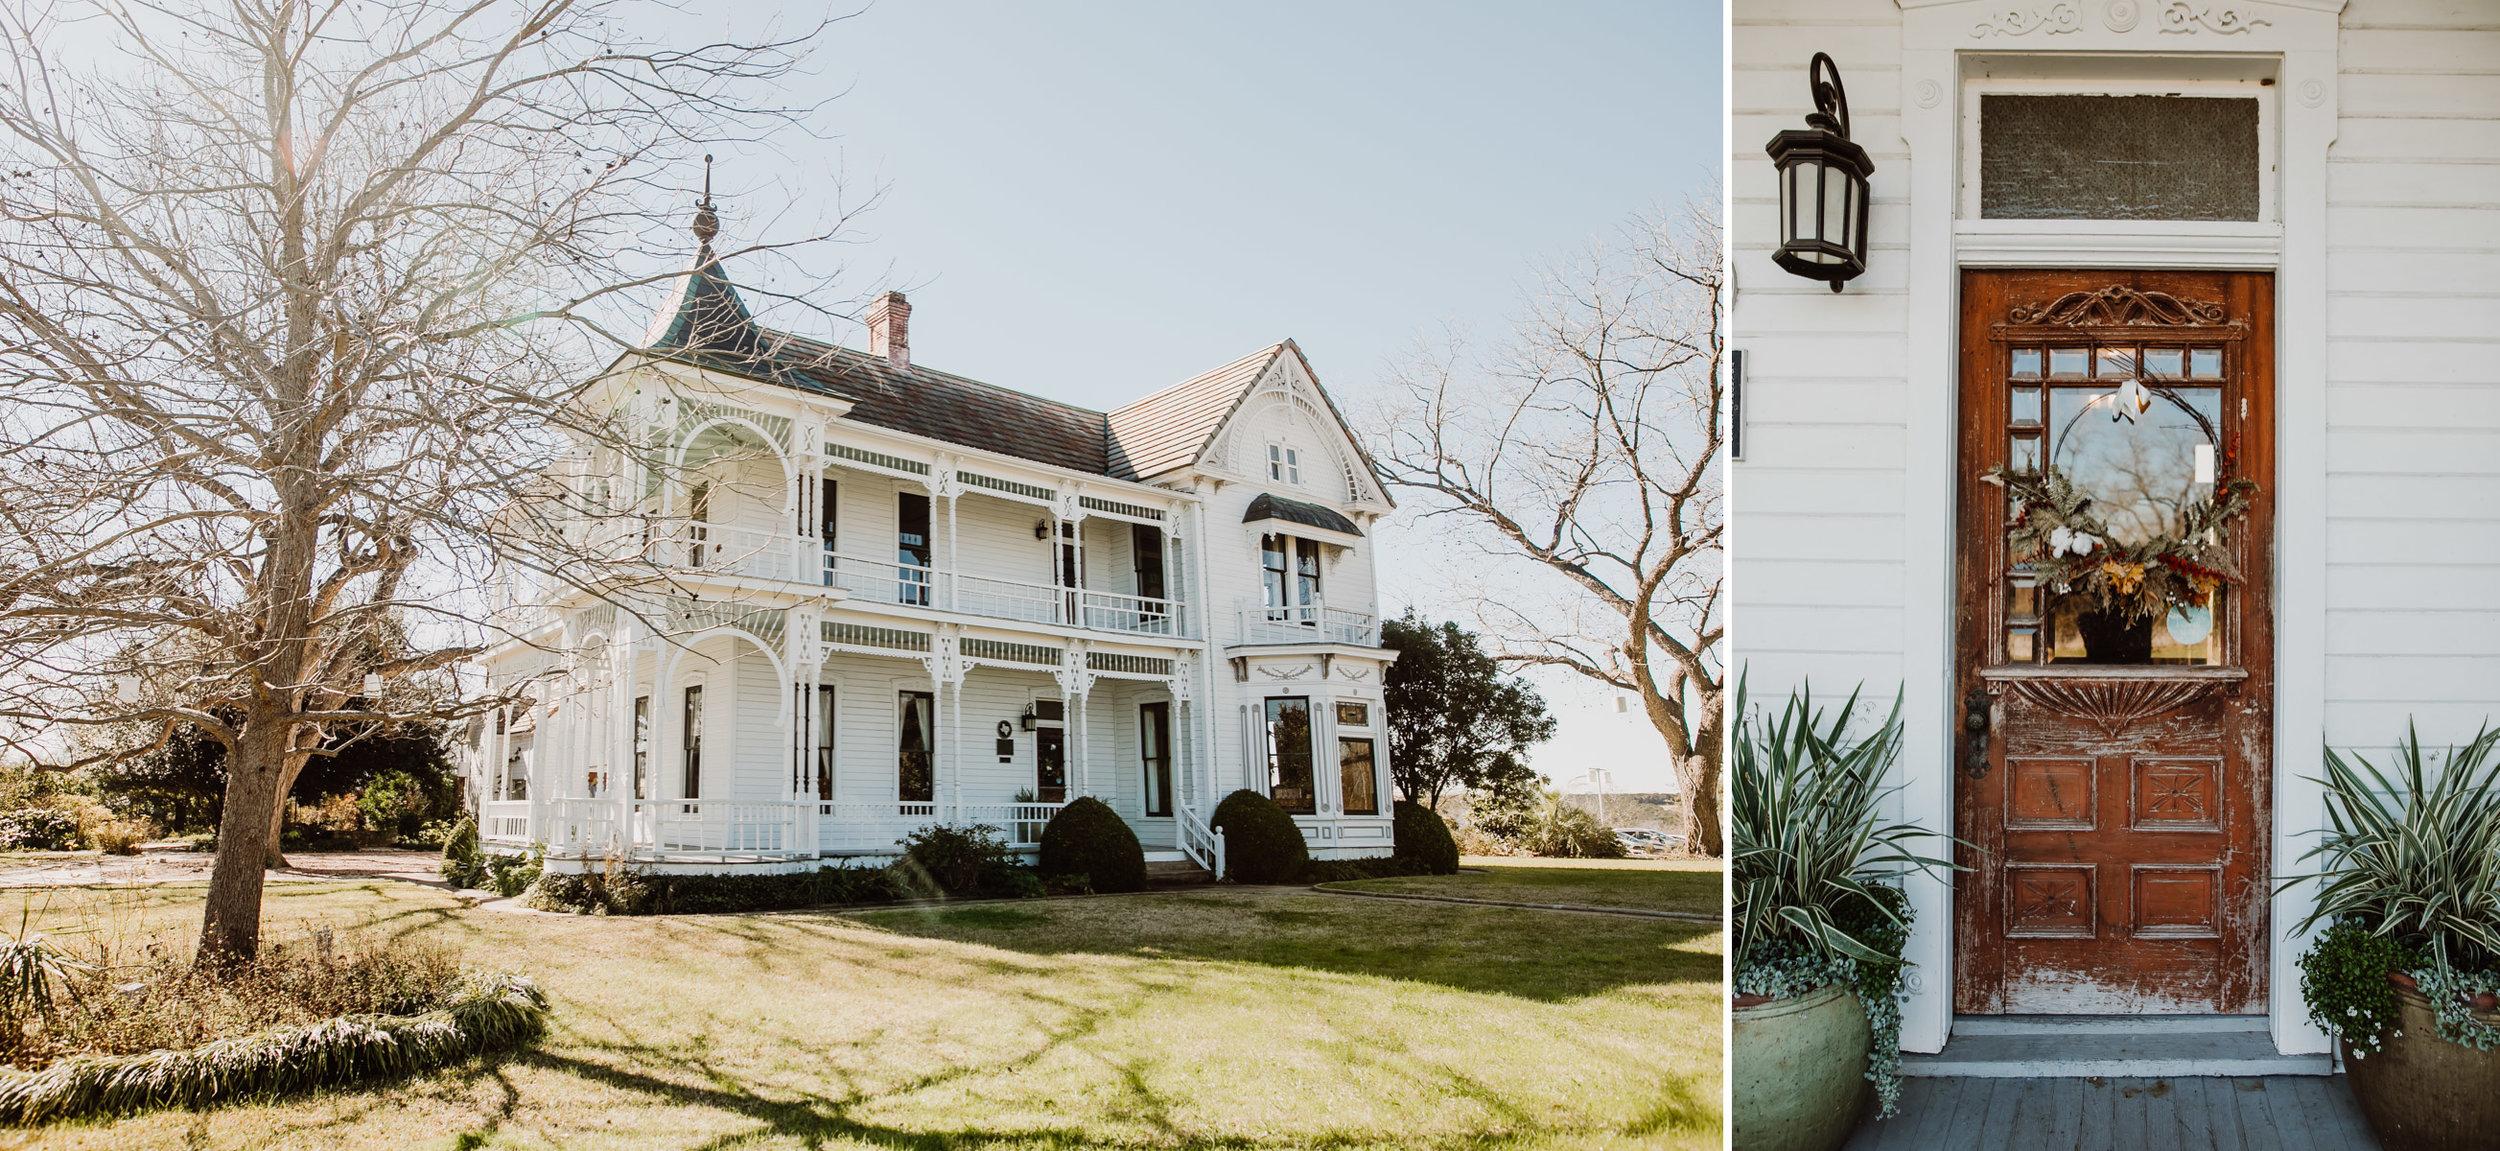 barr-mansion-wedding-1.jpg